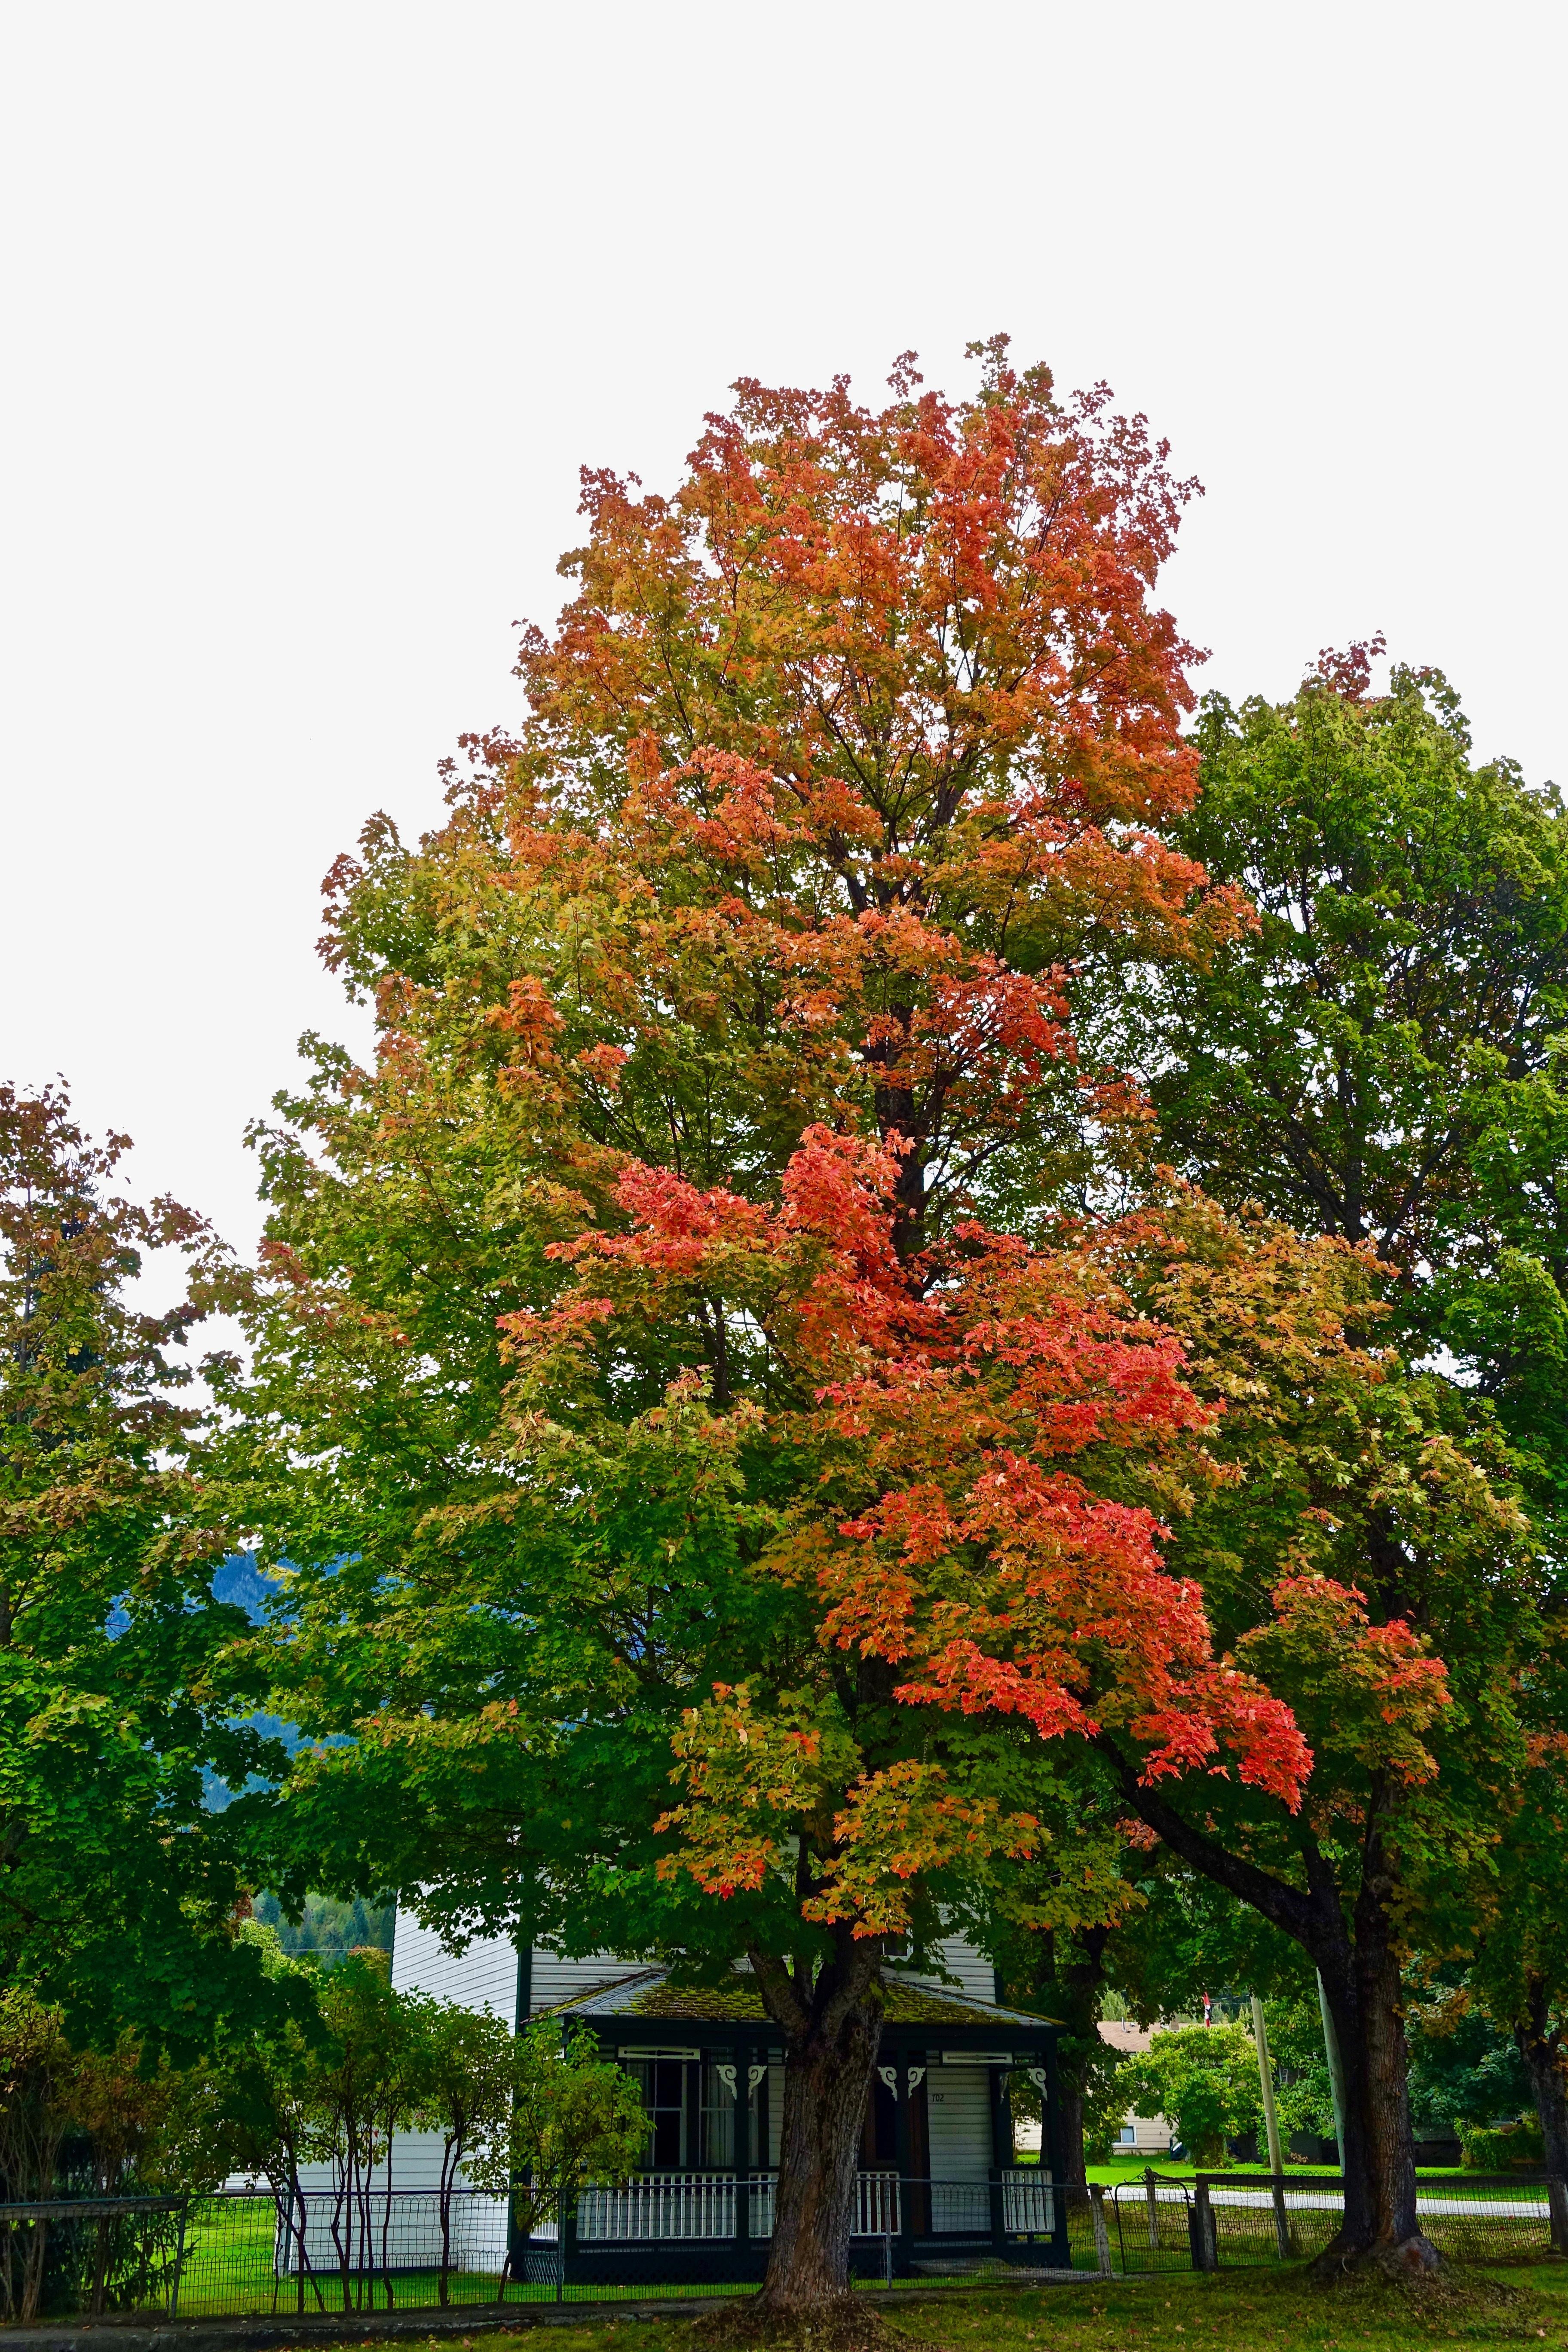 Free Images : leaf, flower, foliage, red, natural, autumn, botany ...